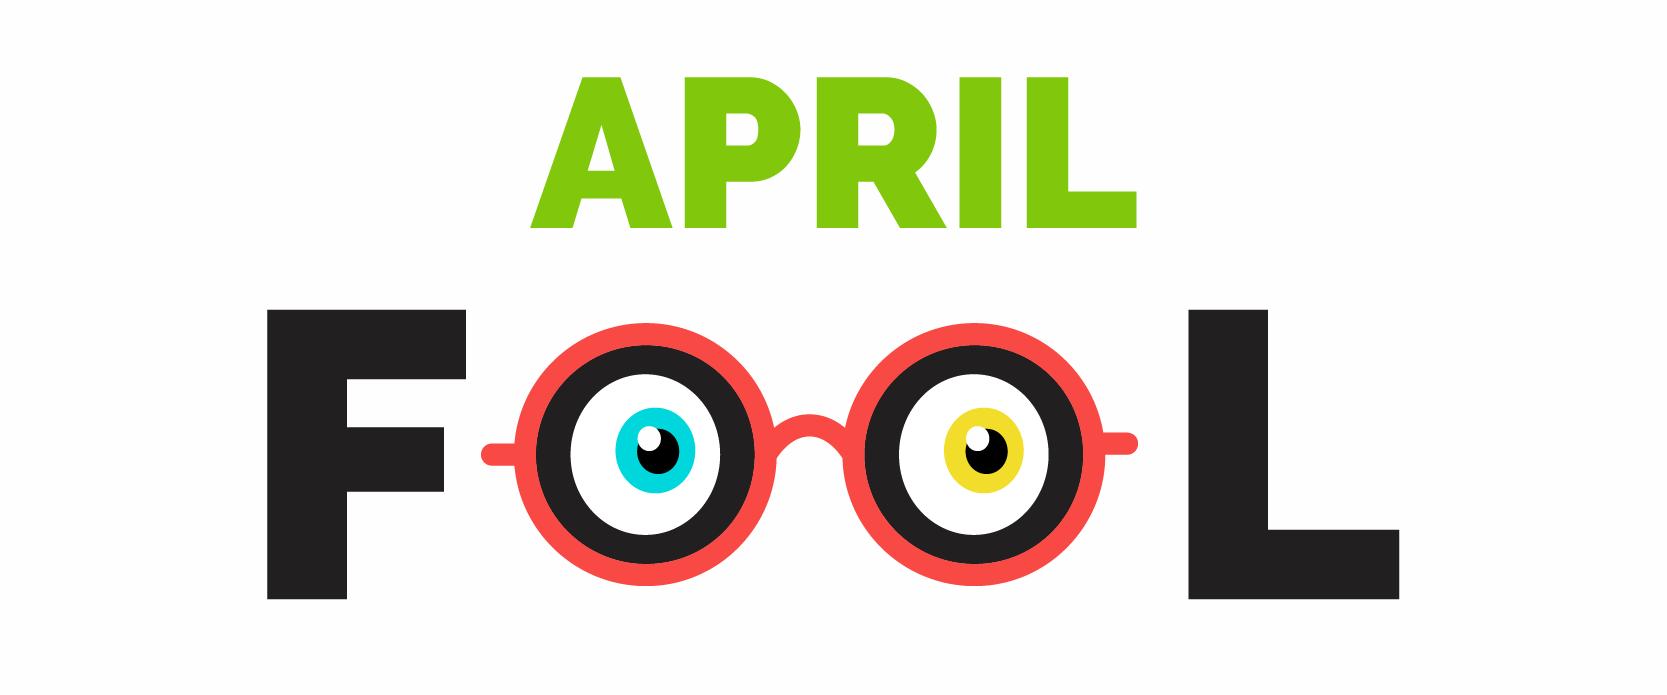 AprilFool-01.png